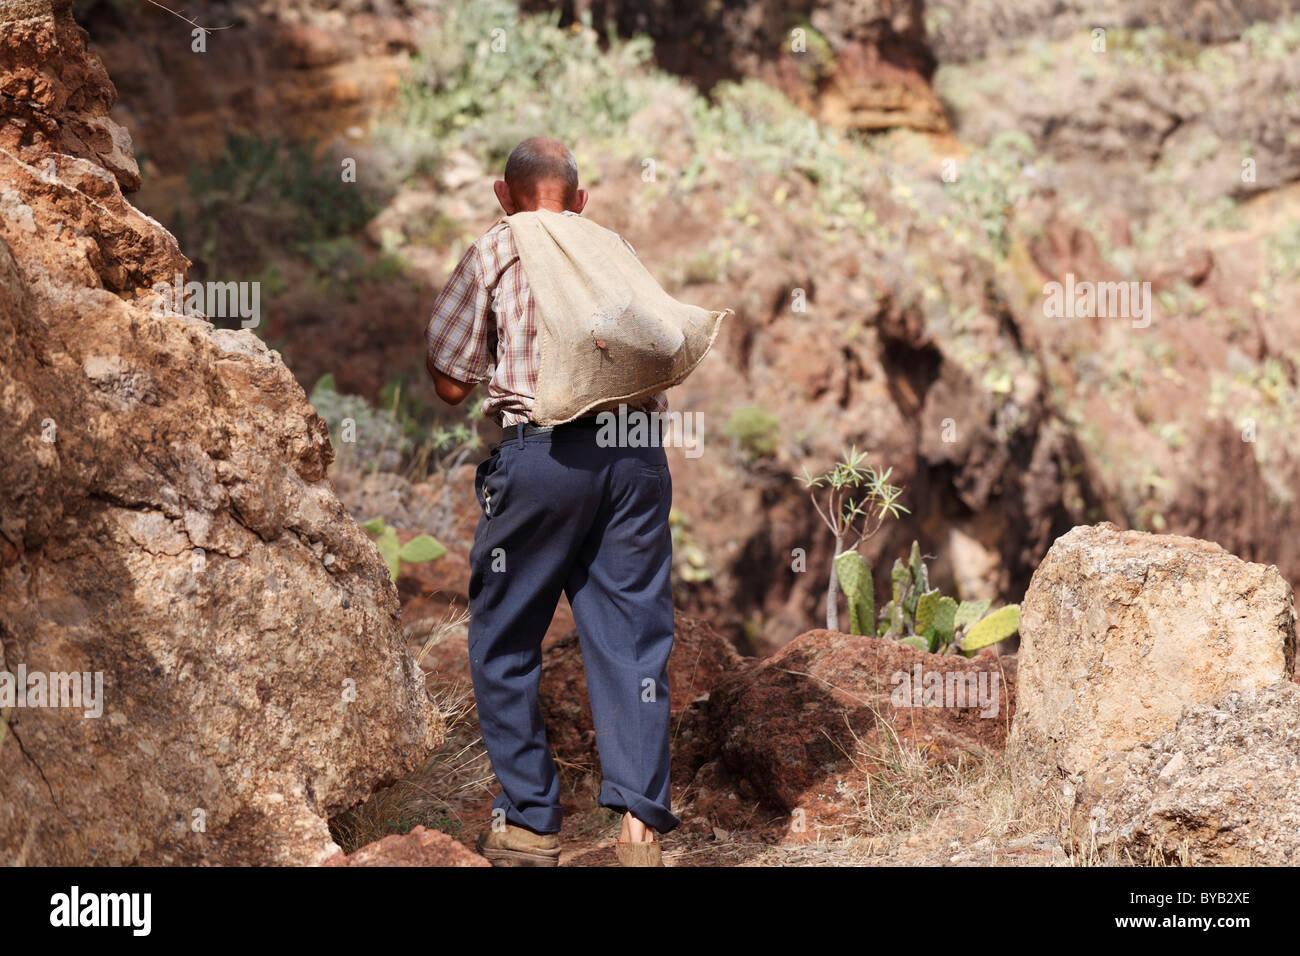 Local man carrying a sack on his back, Barranco de Guarimiar near Alajeró, La Gomera, Canary Islands, Spain, - Stock Image